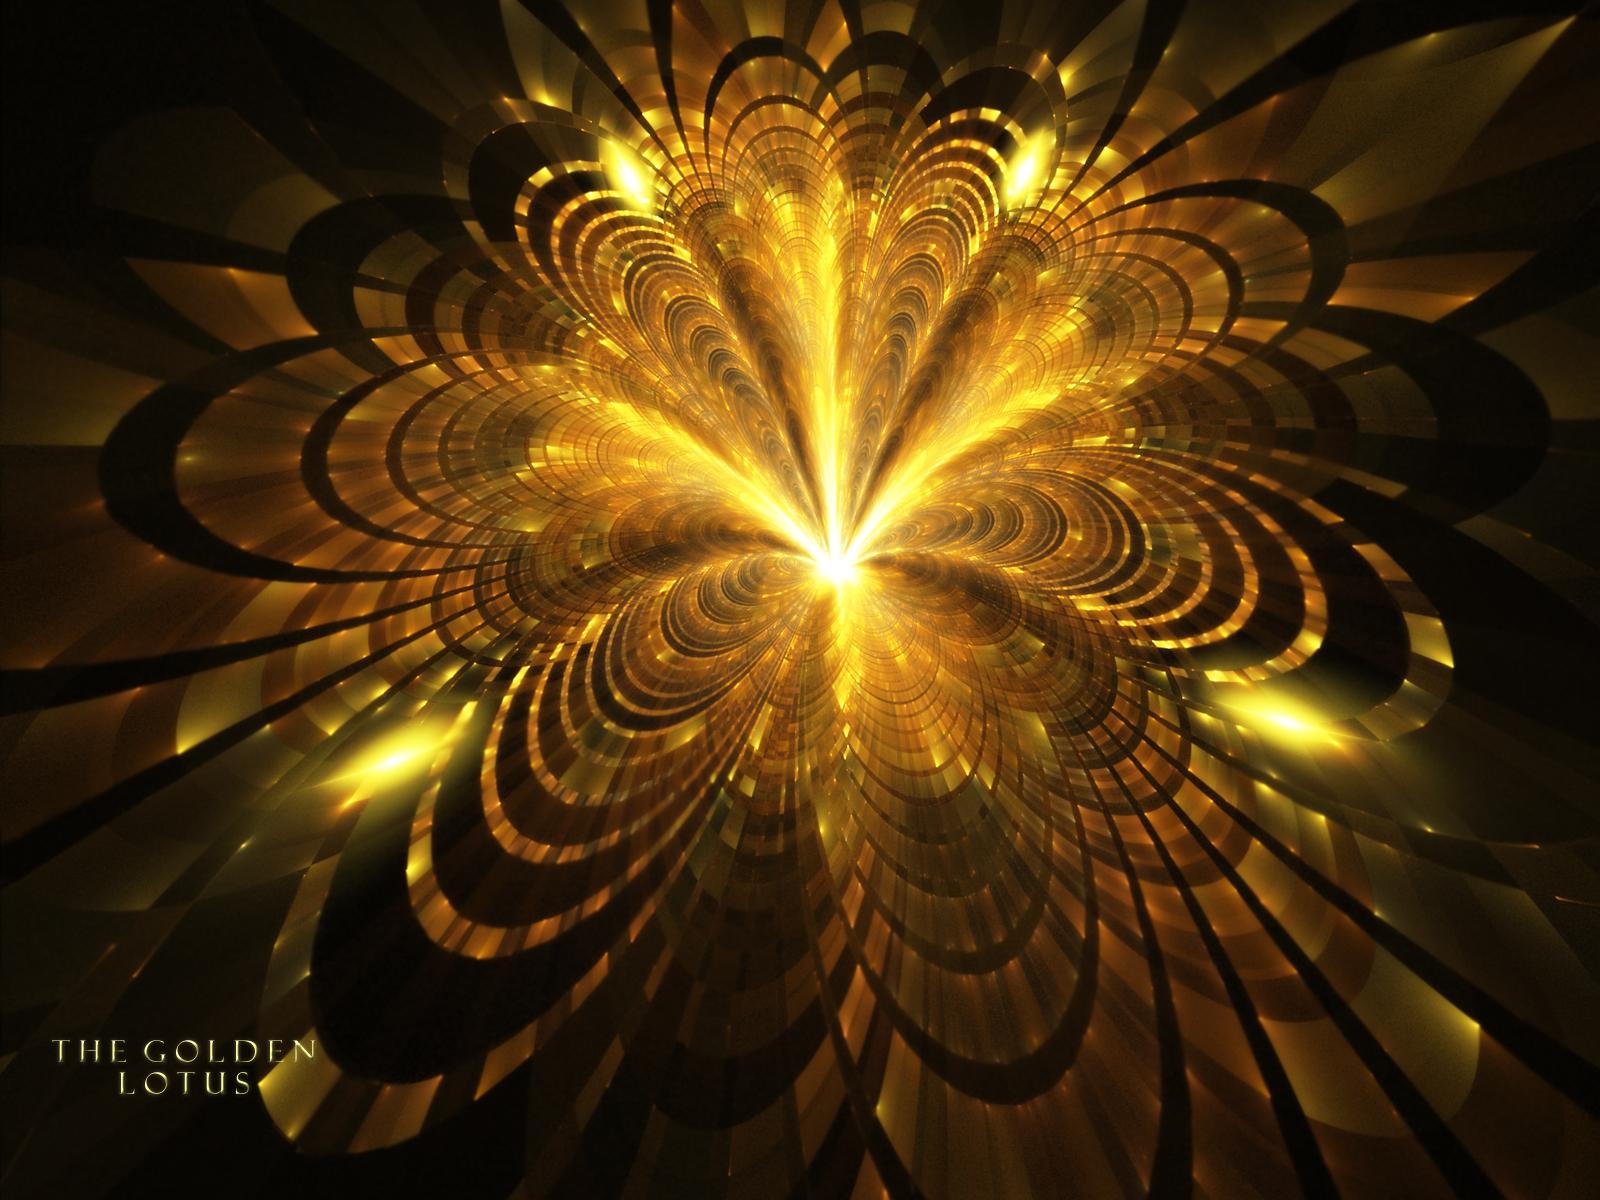 Golden Rose Wallpaper The Golden Lotus Wallpaper